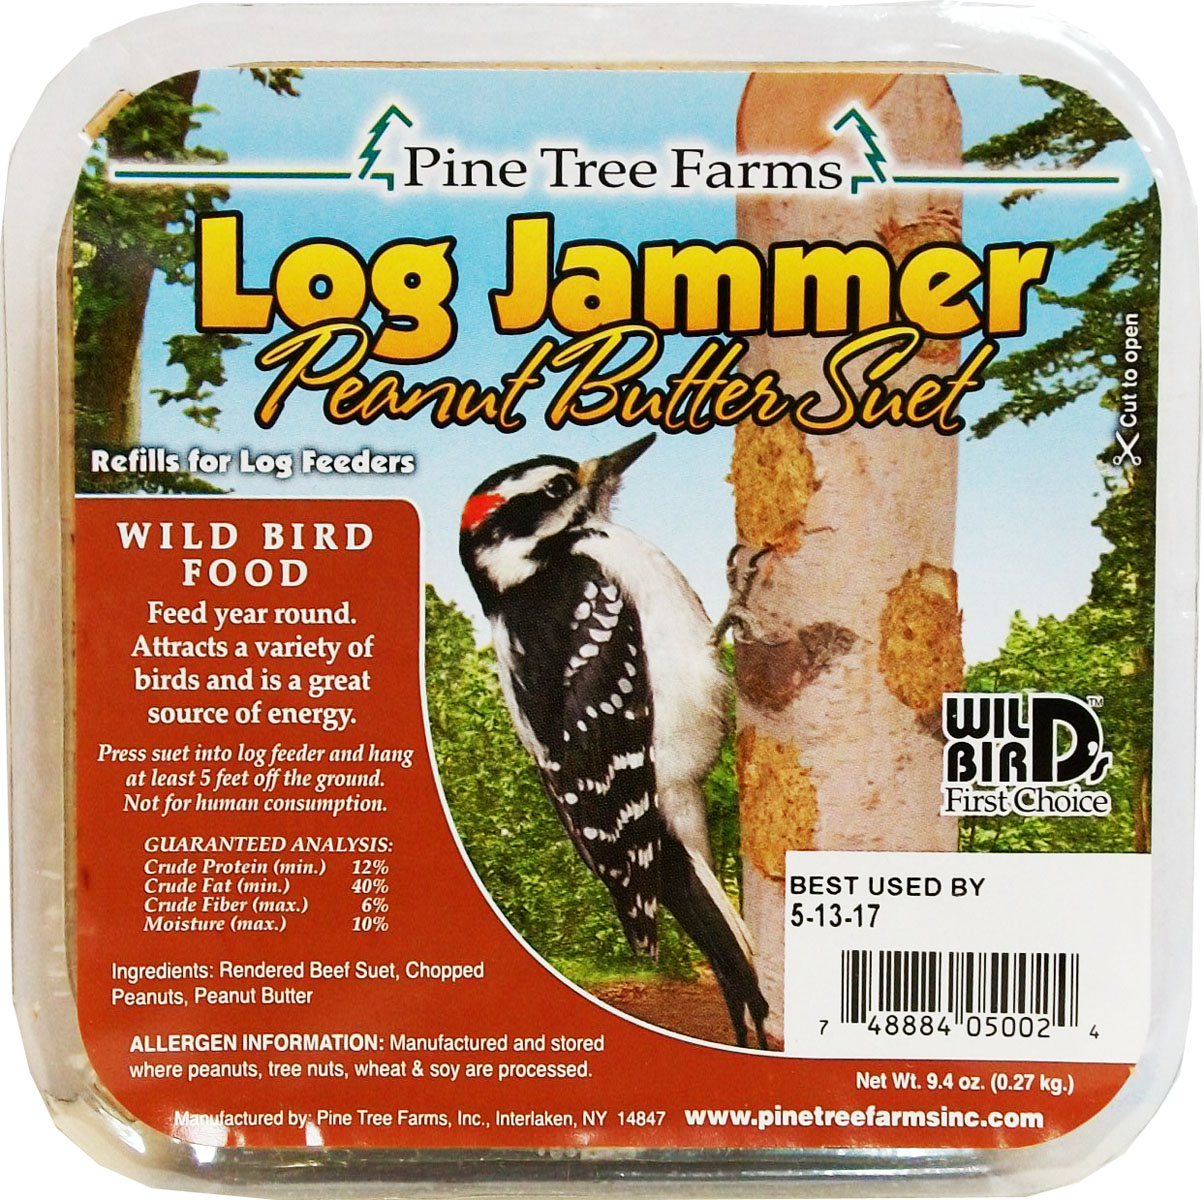 Pine Tree Farms Log Jammer Peanut Butter Suet Wild Bird Food, 9.4-oz